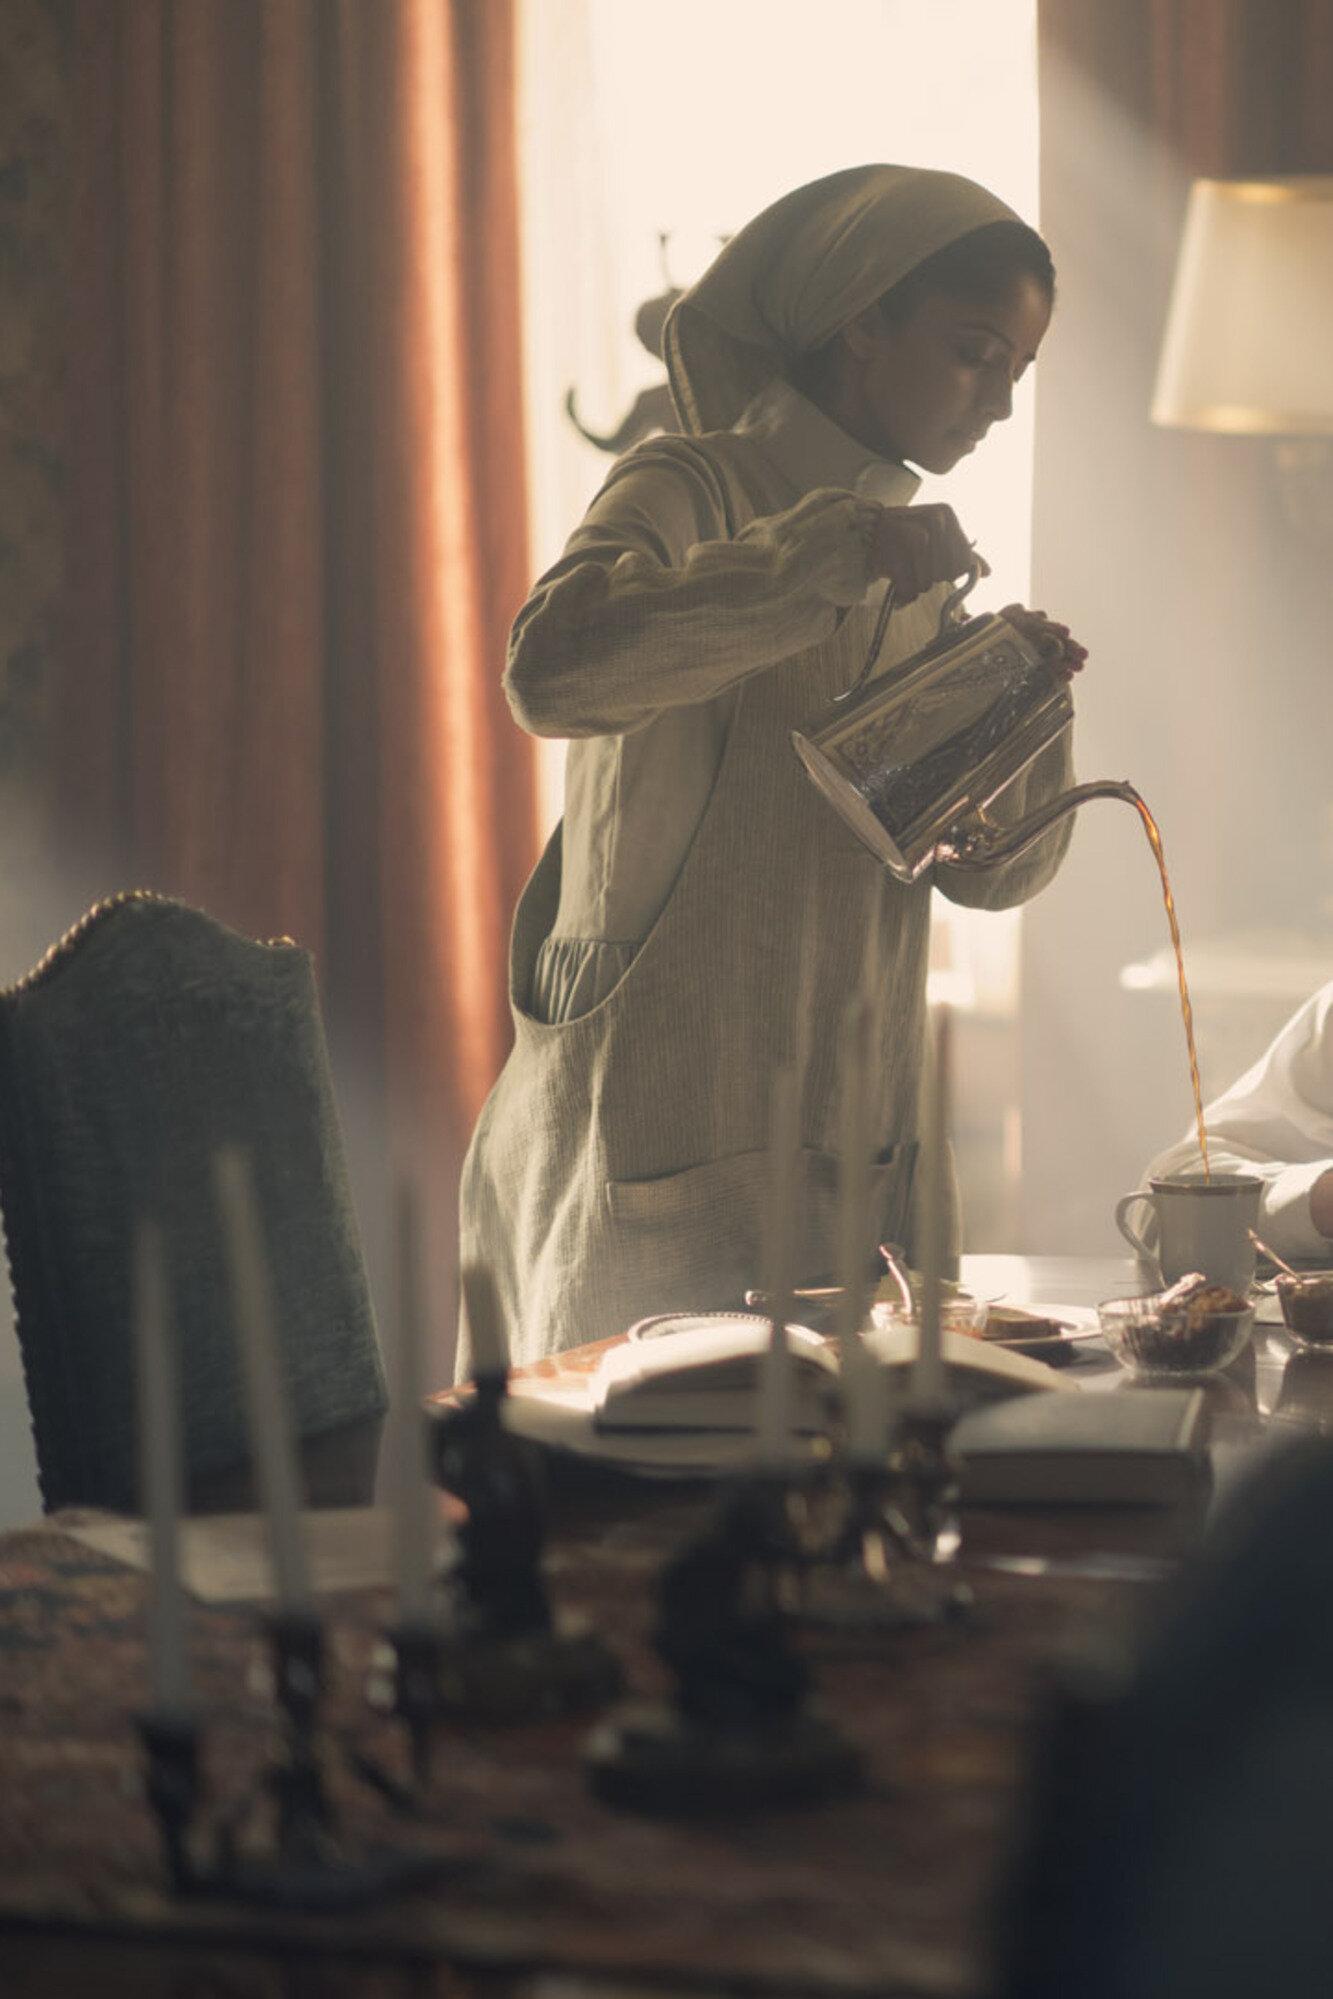 The Handmaid's Tale : La servante écarlate - Méfiance